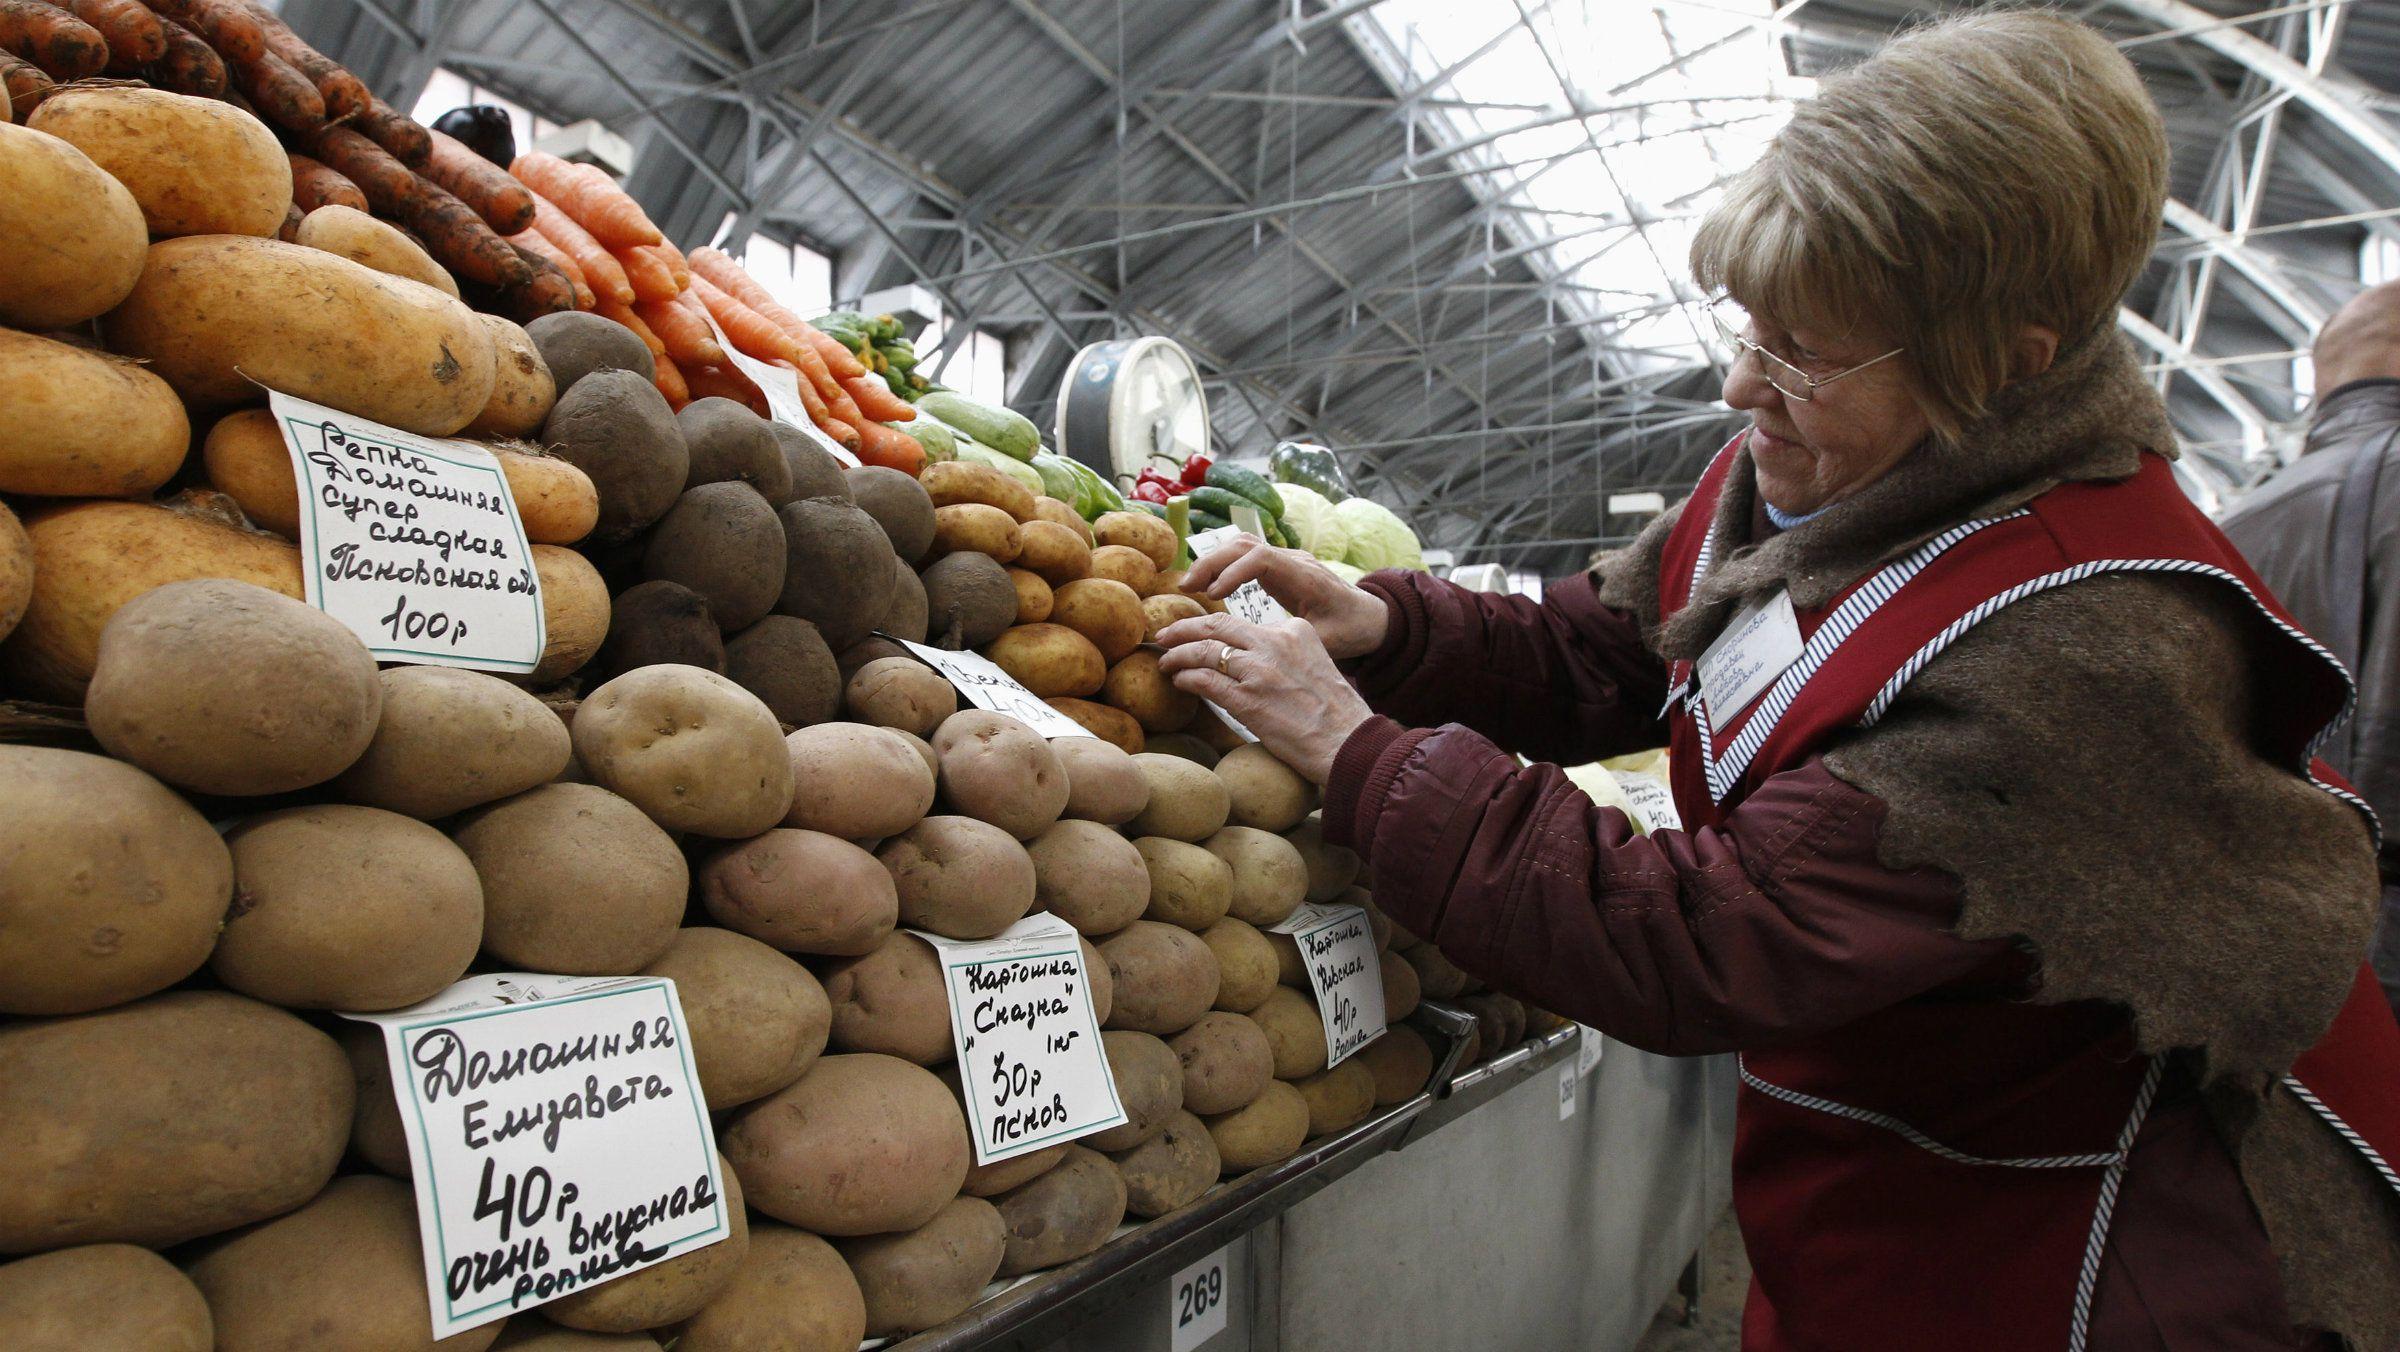 A vendor sells potatoes at the city market in St. Petersburg.